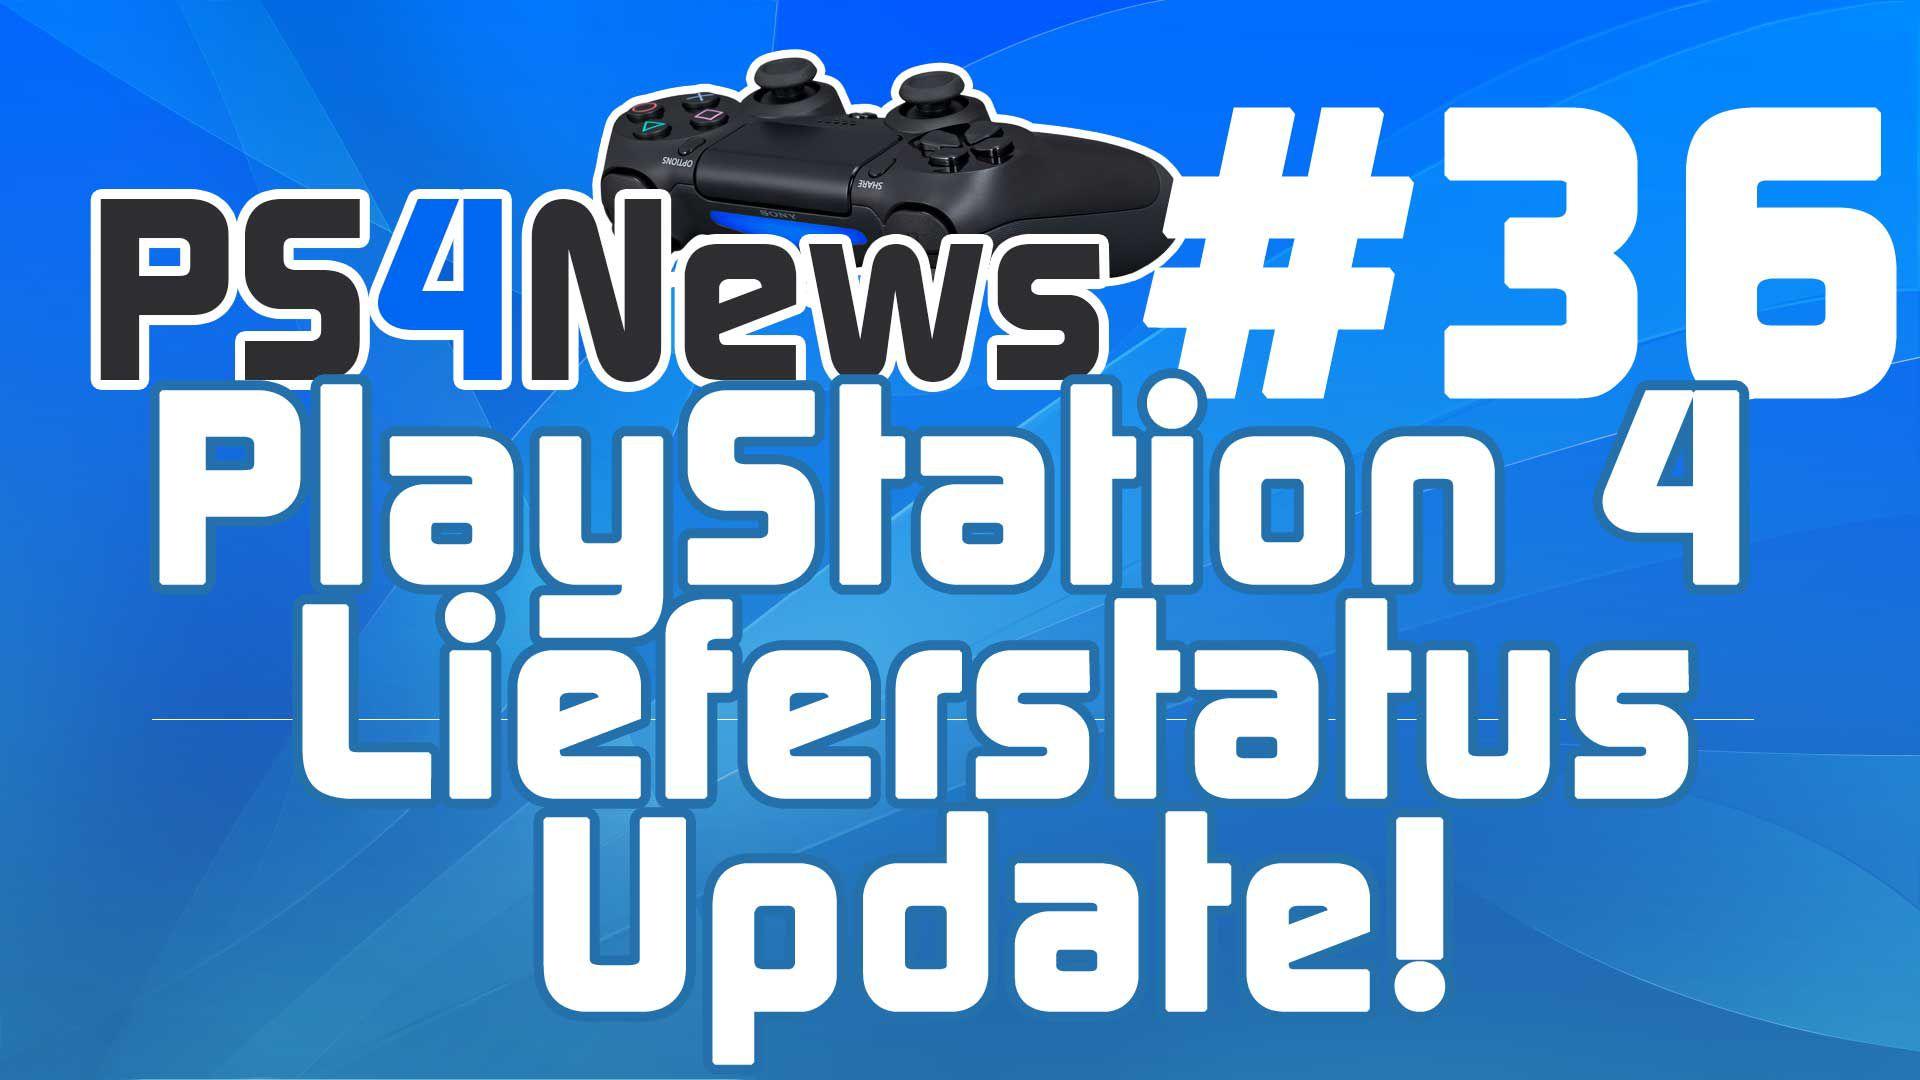 PlayStation 4 Lieferstatus Update inkl. Killzone Shadow Fall Bundle